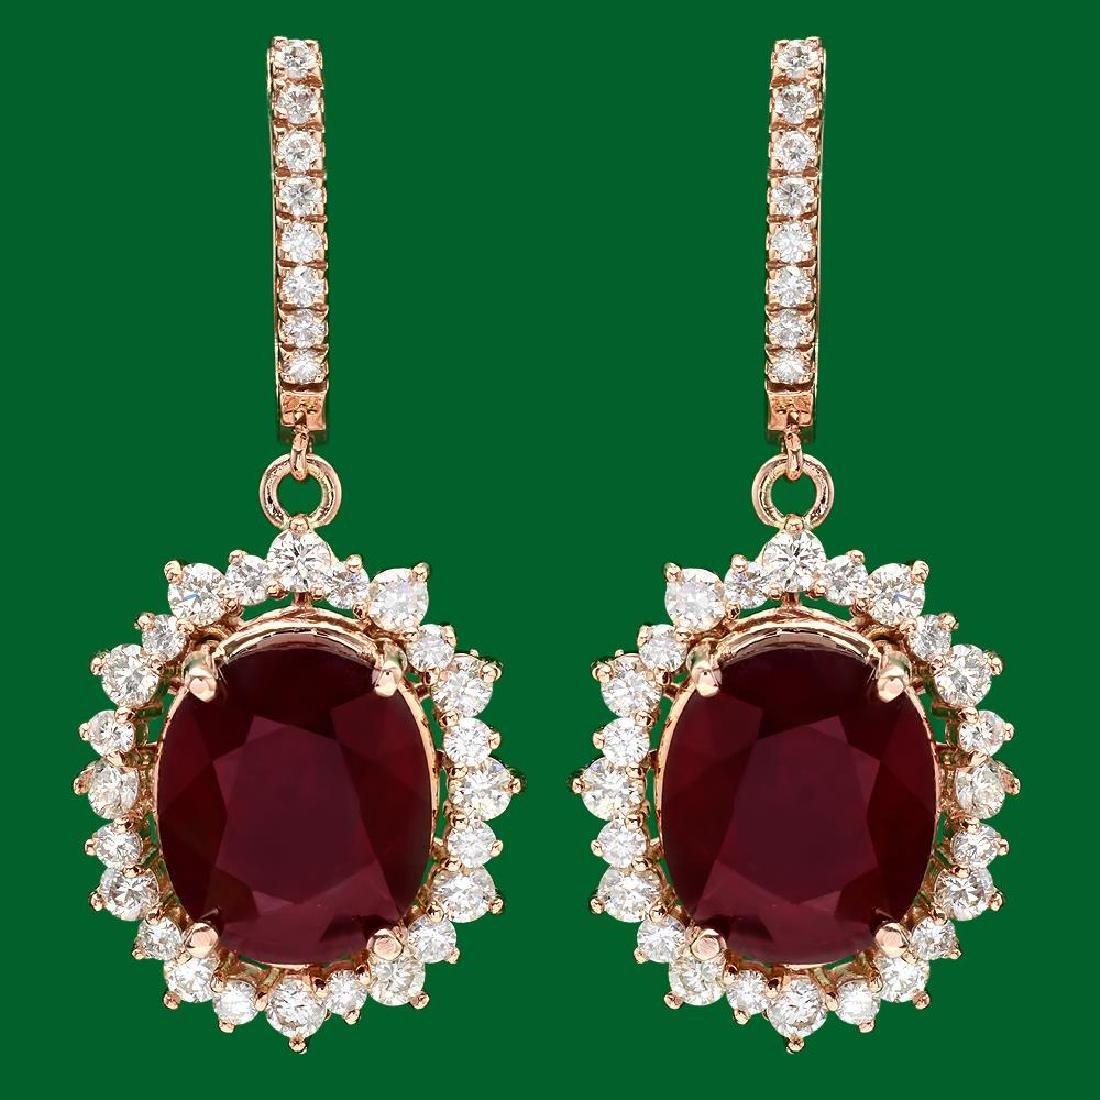 14k Gold 18.88ct Ruby 2.65ct Diamond Earrings